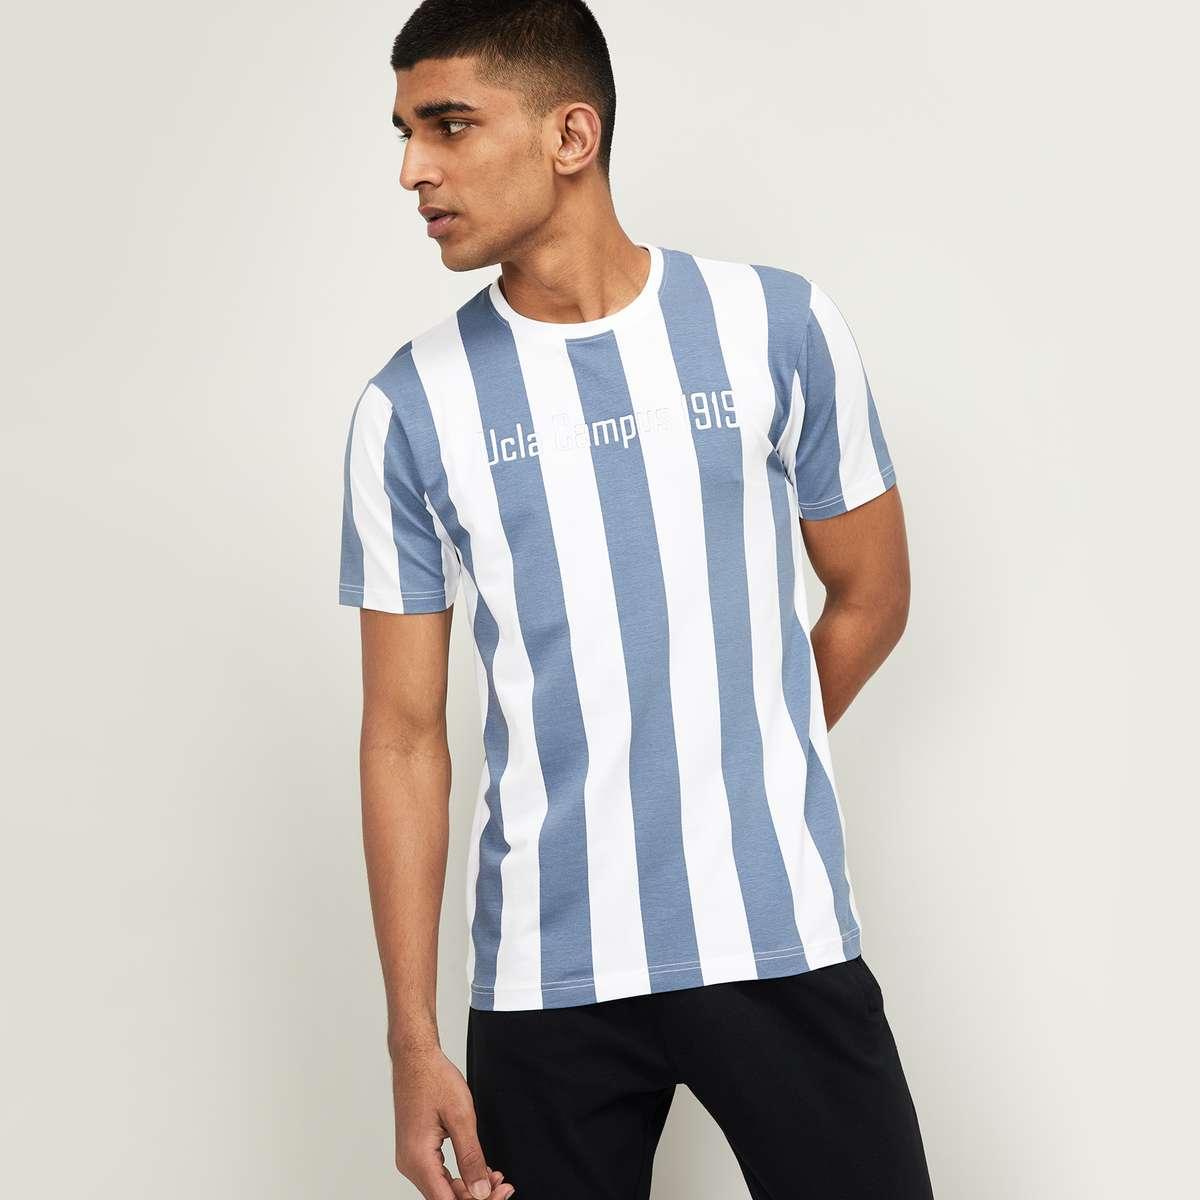 UCLA Men Typographic Print Regular Fit Striped T-shirt